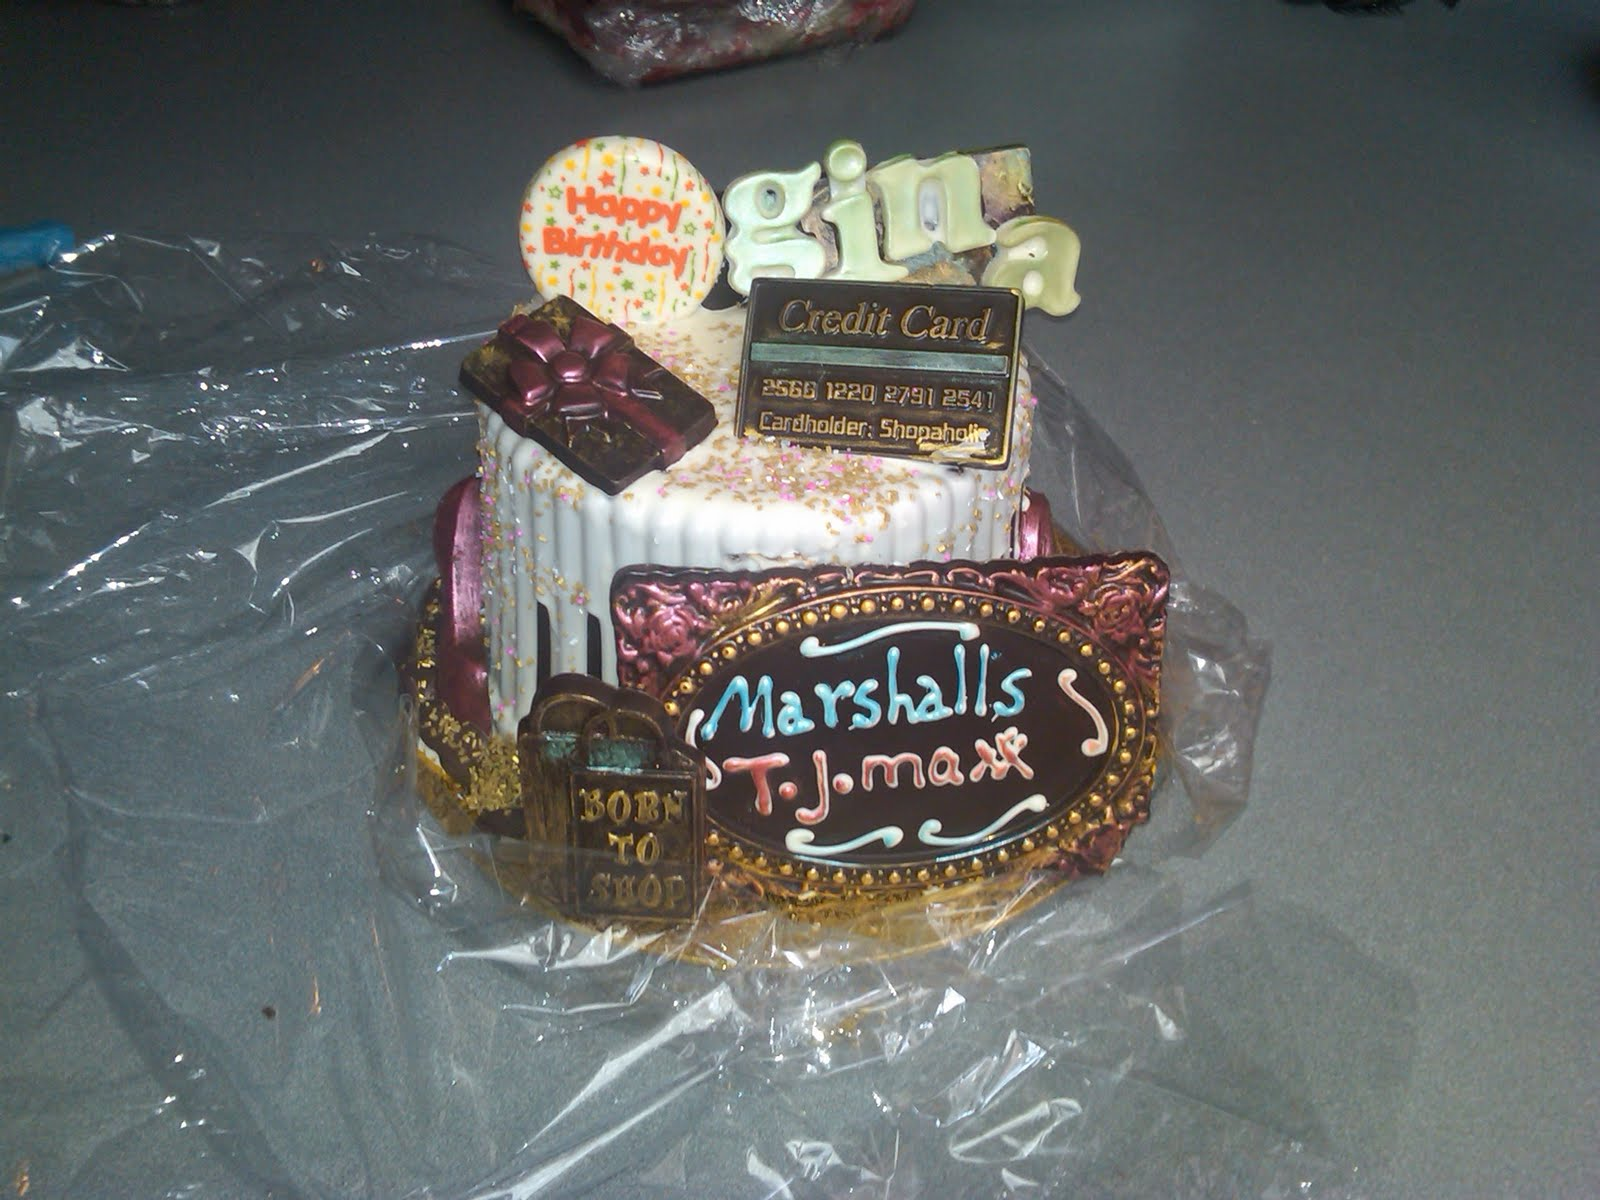 http://3.bp.blogspot.com/-JAuhMZIzF9Q/TbthRwj9JkI/AAAAAAAAAZA/cy9QuBSafXI/s1600/moms+smash+cake+2.jpg